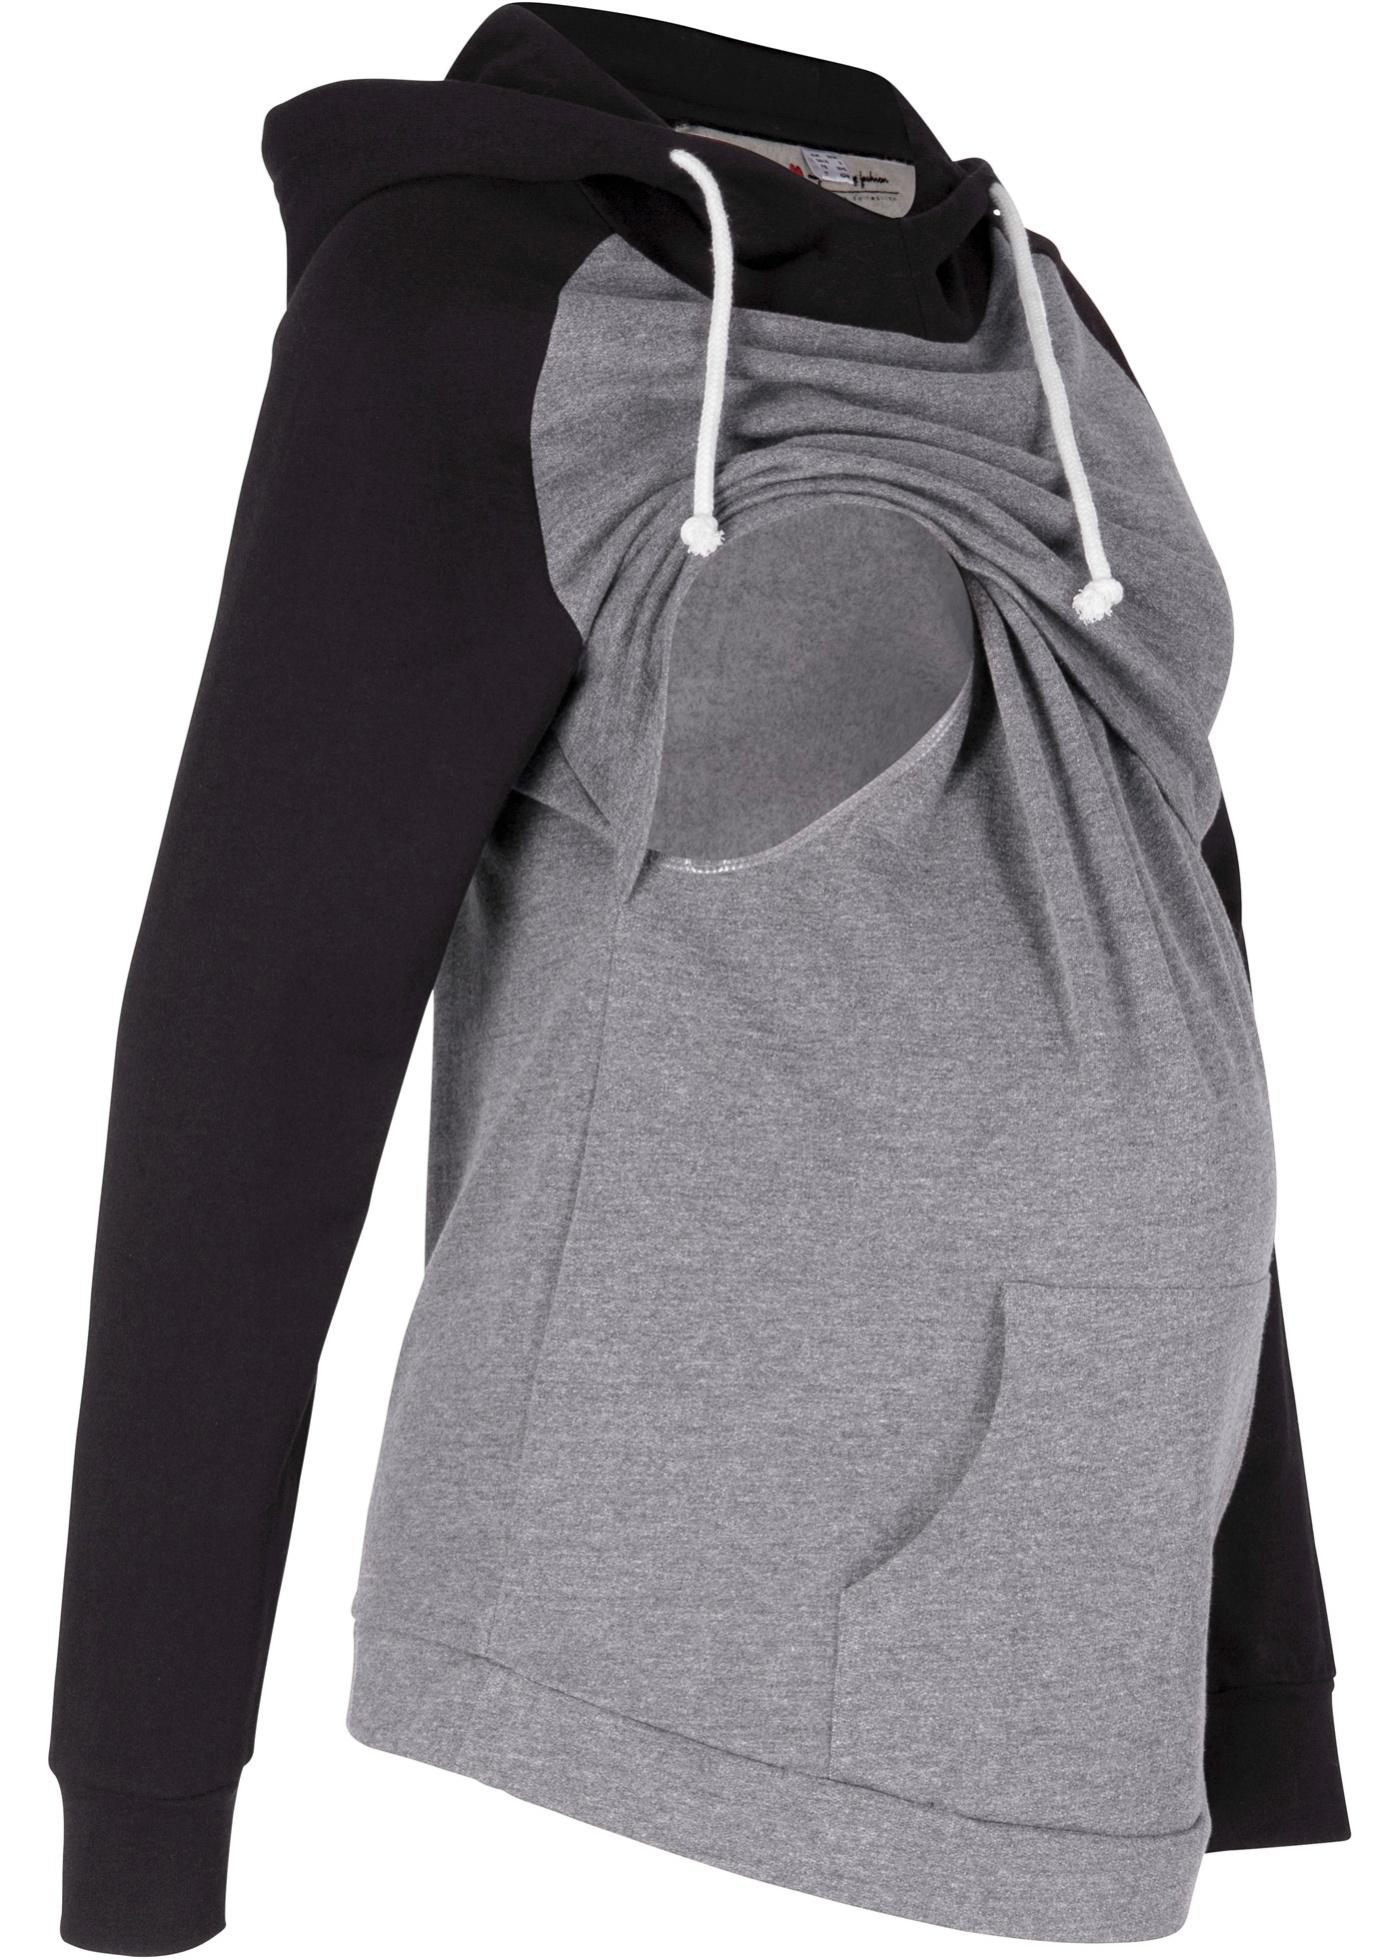 Schwangerschaftsmode - Sweat Umstandsshirt Sweat Stillshirt › bonprix › schwarz  - Onlineshop Bonprix